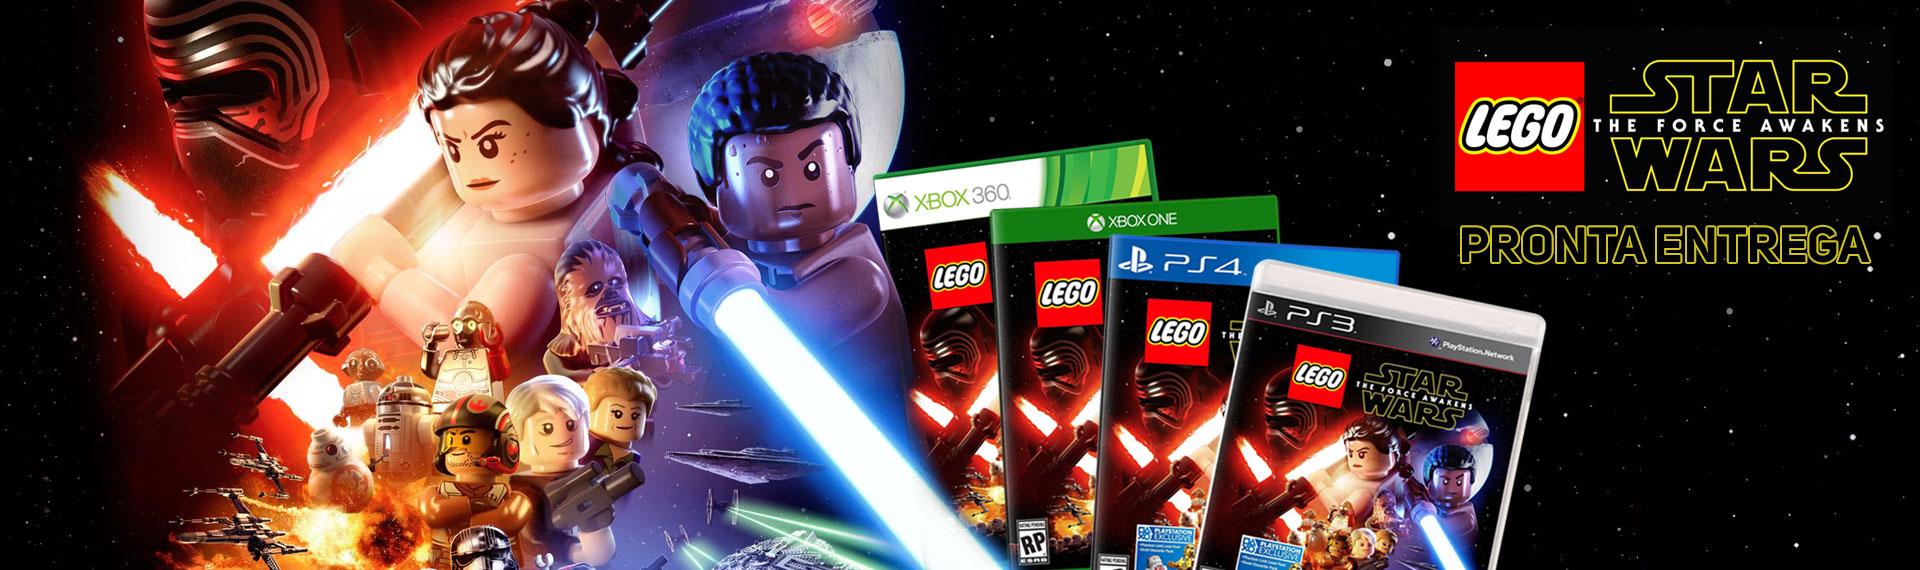 PRÉ-VENDA Lego Star Wars Ep VII